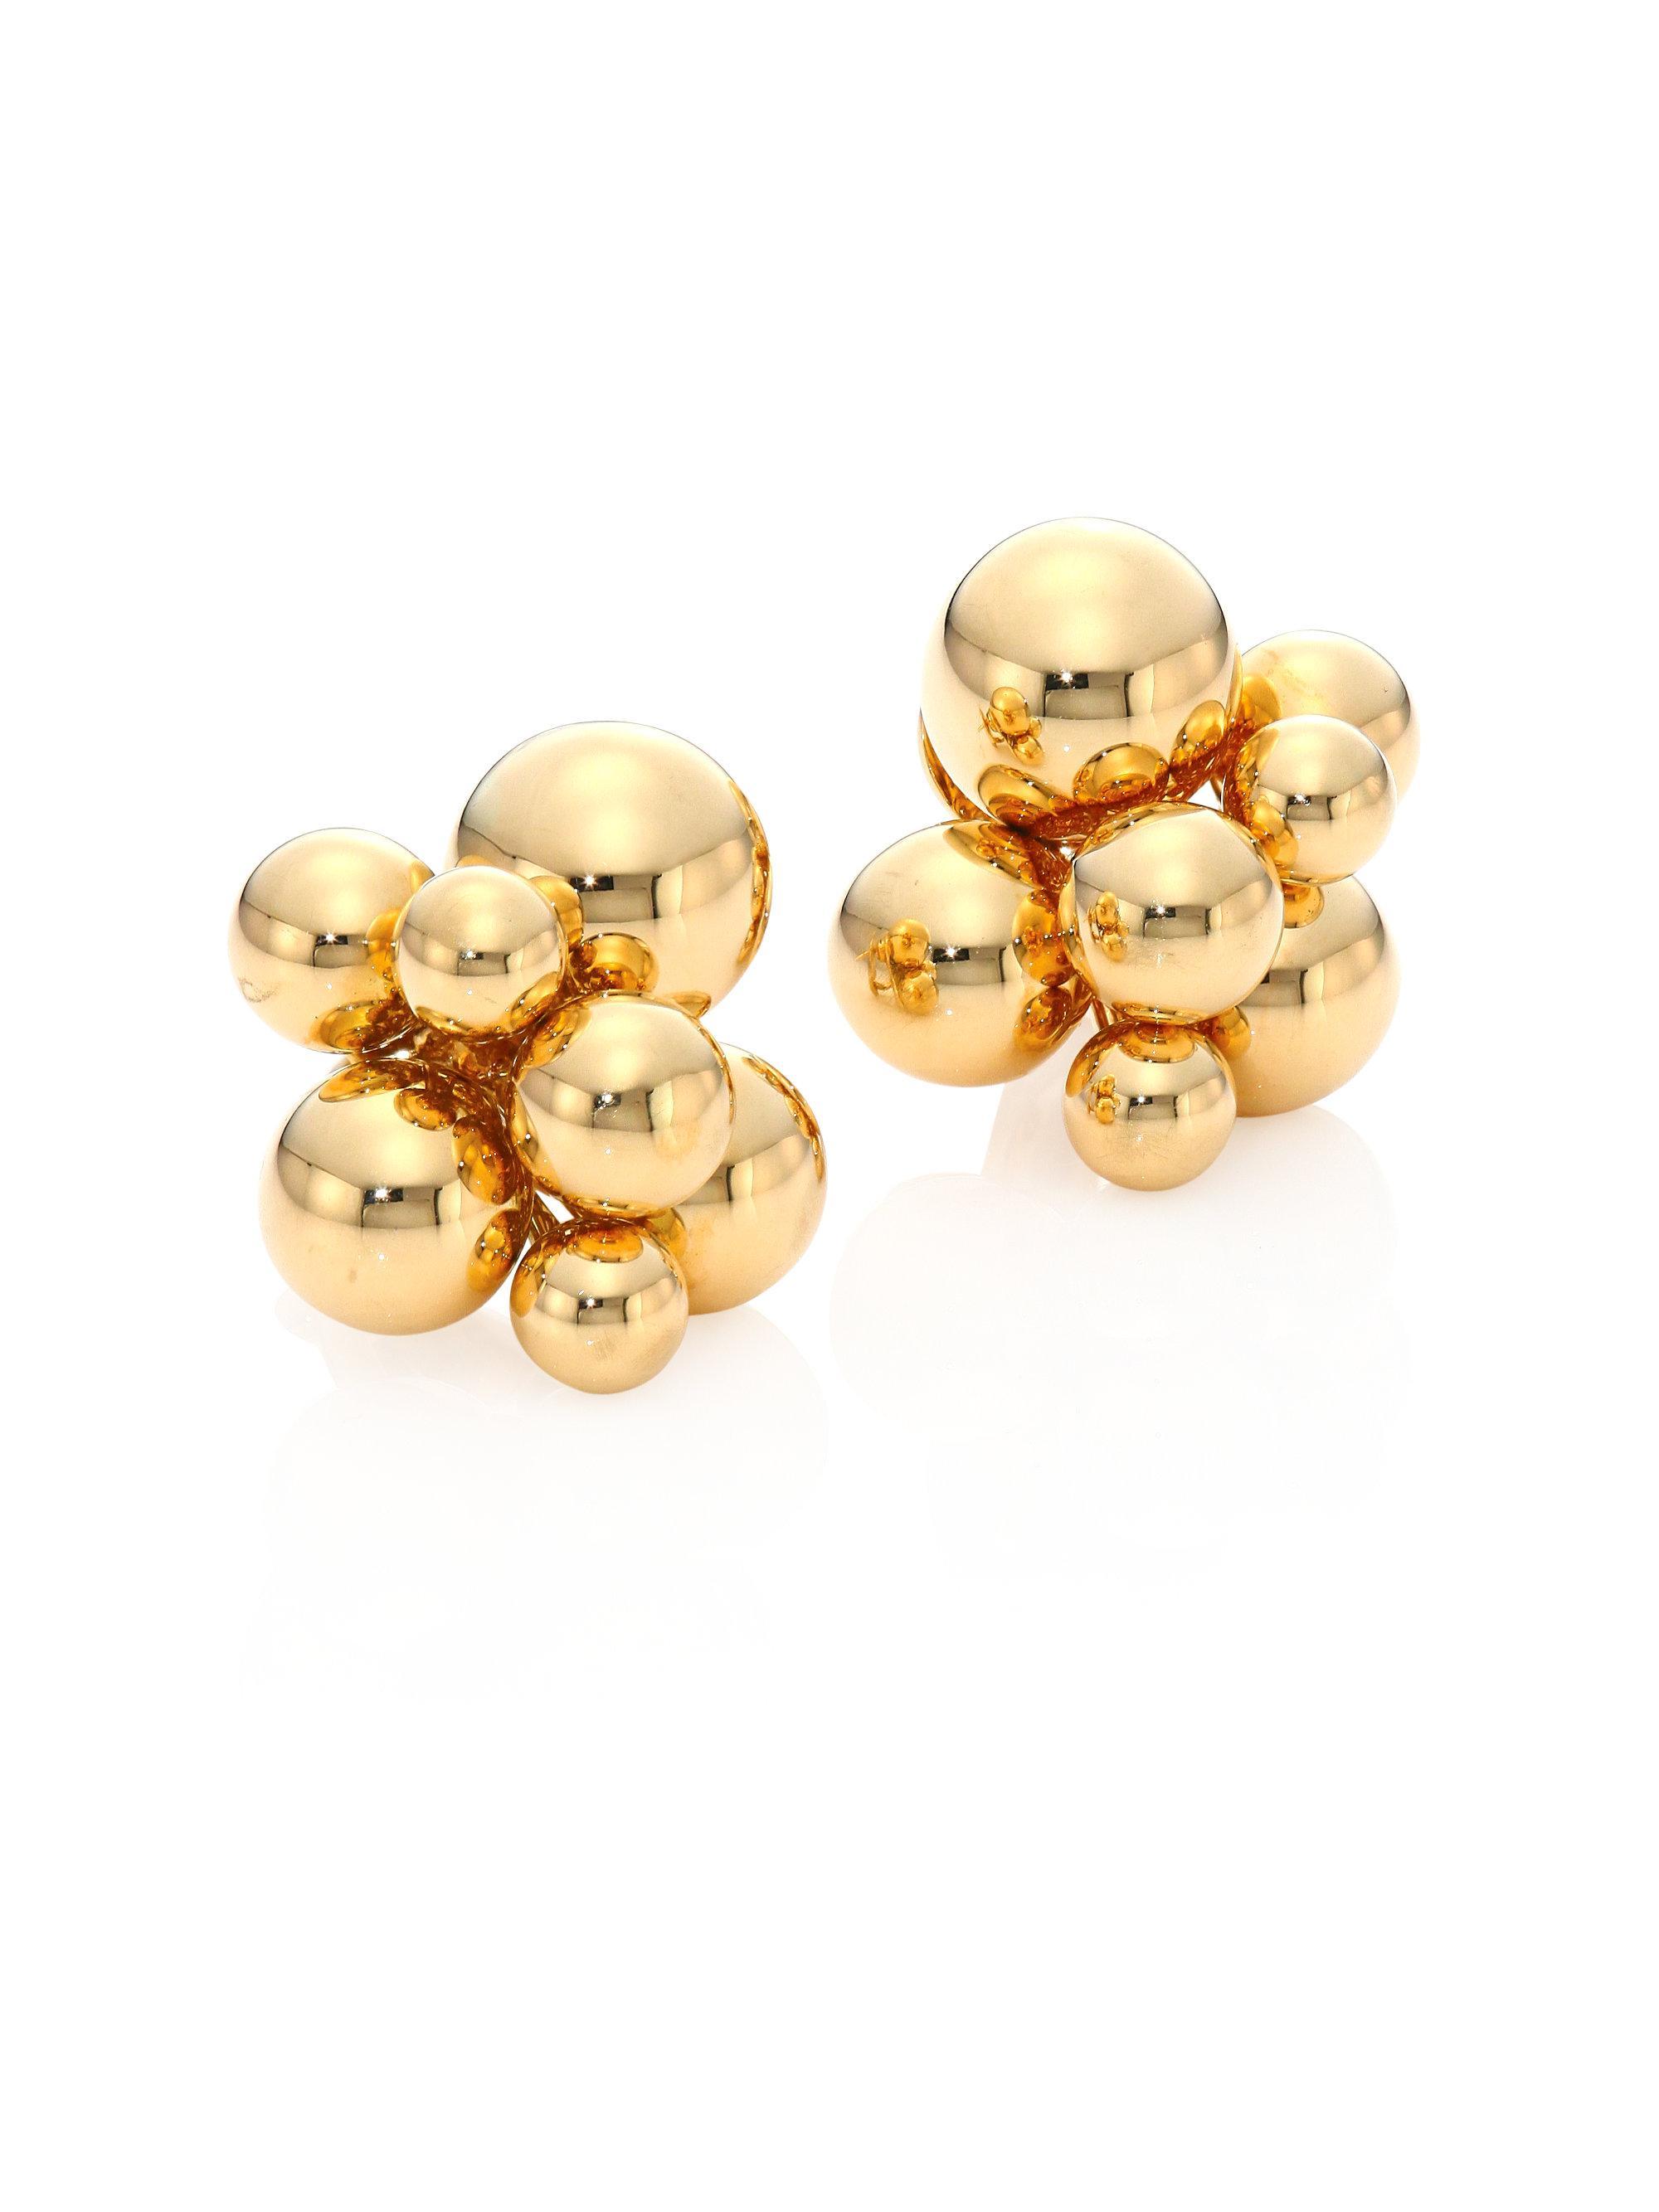 Marina B Atomo 18k Yellow Gold Cluster Ring 3LsGFY3b